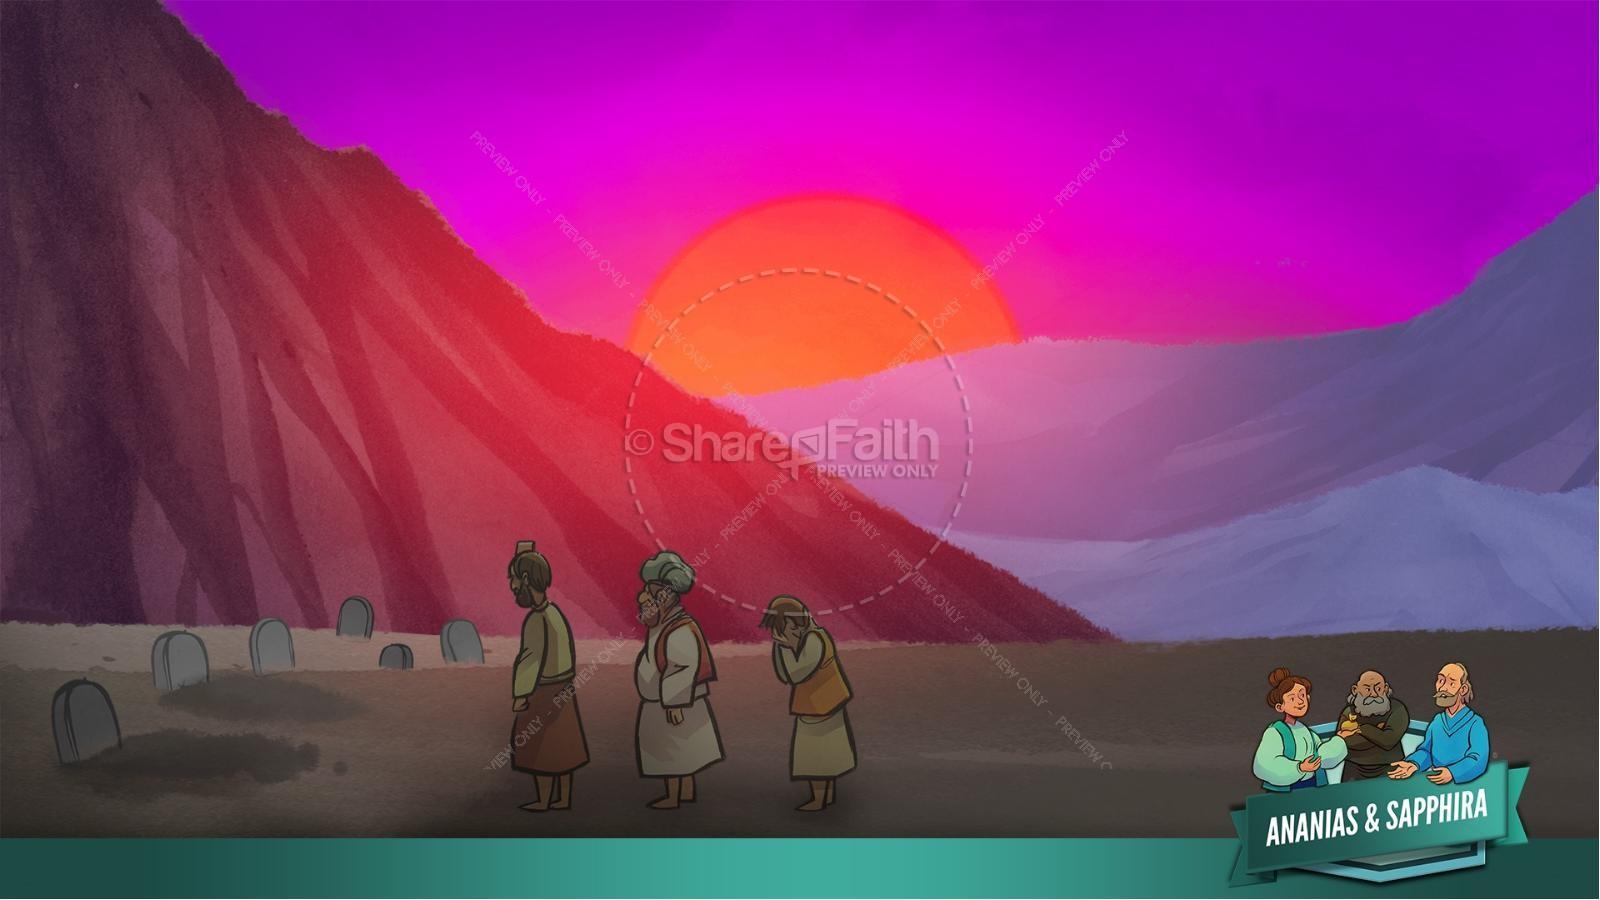 Acts 5 Ananias and Sapphira Kids Bible Stories | slide 44